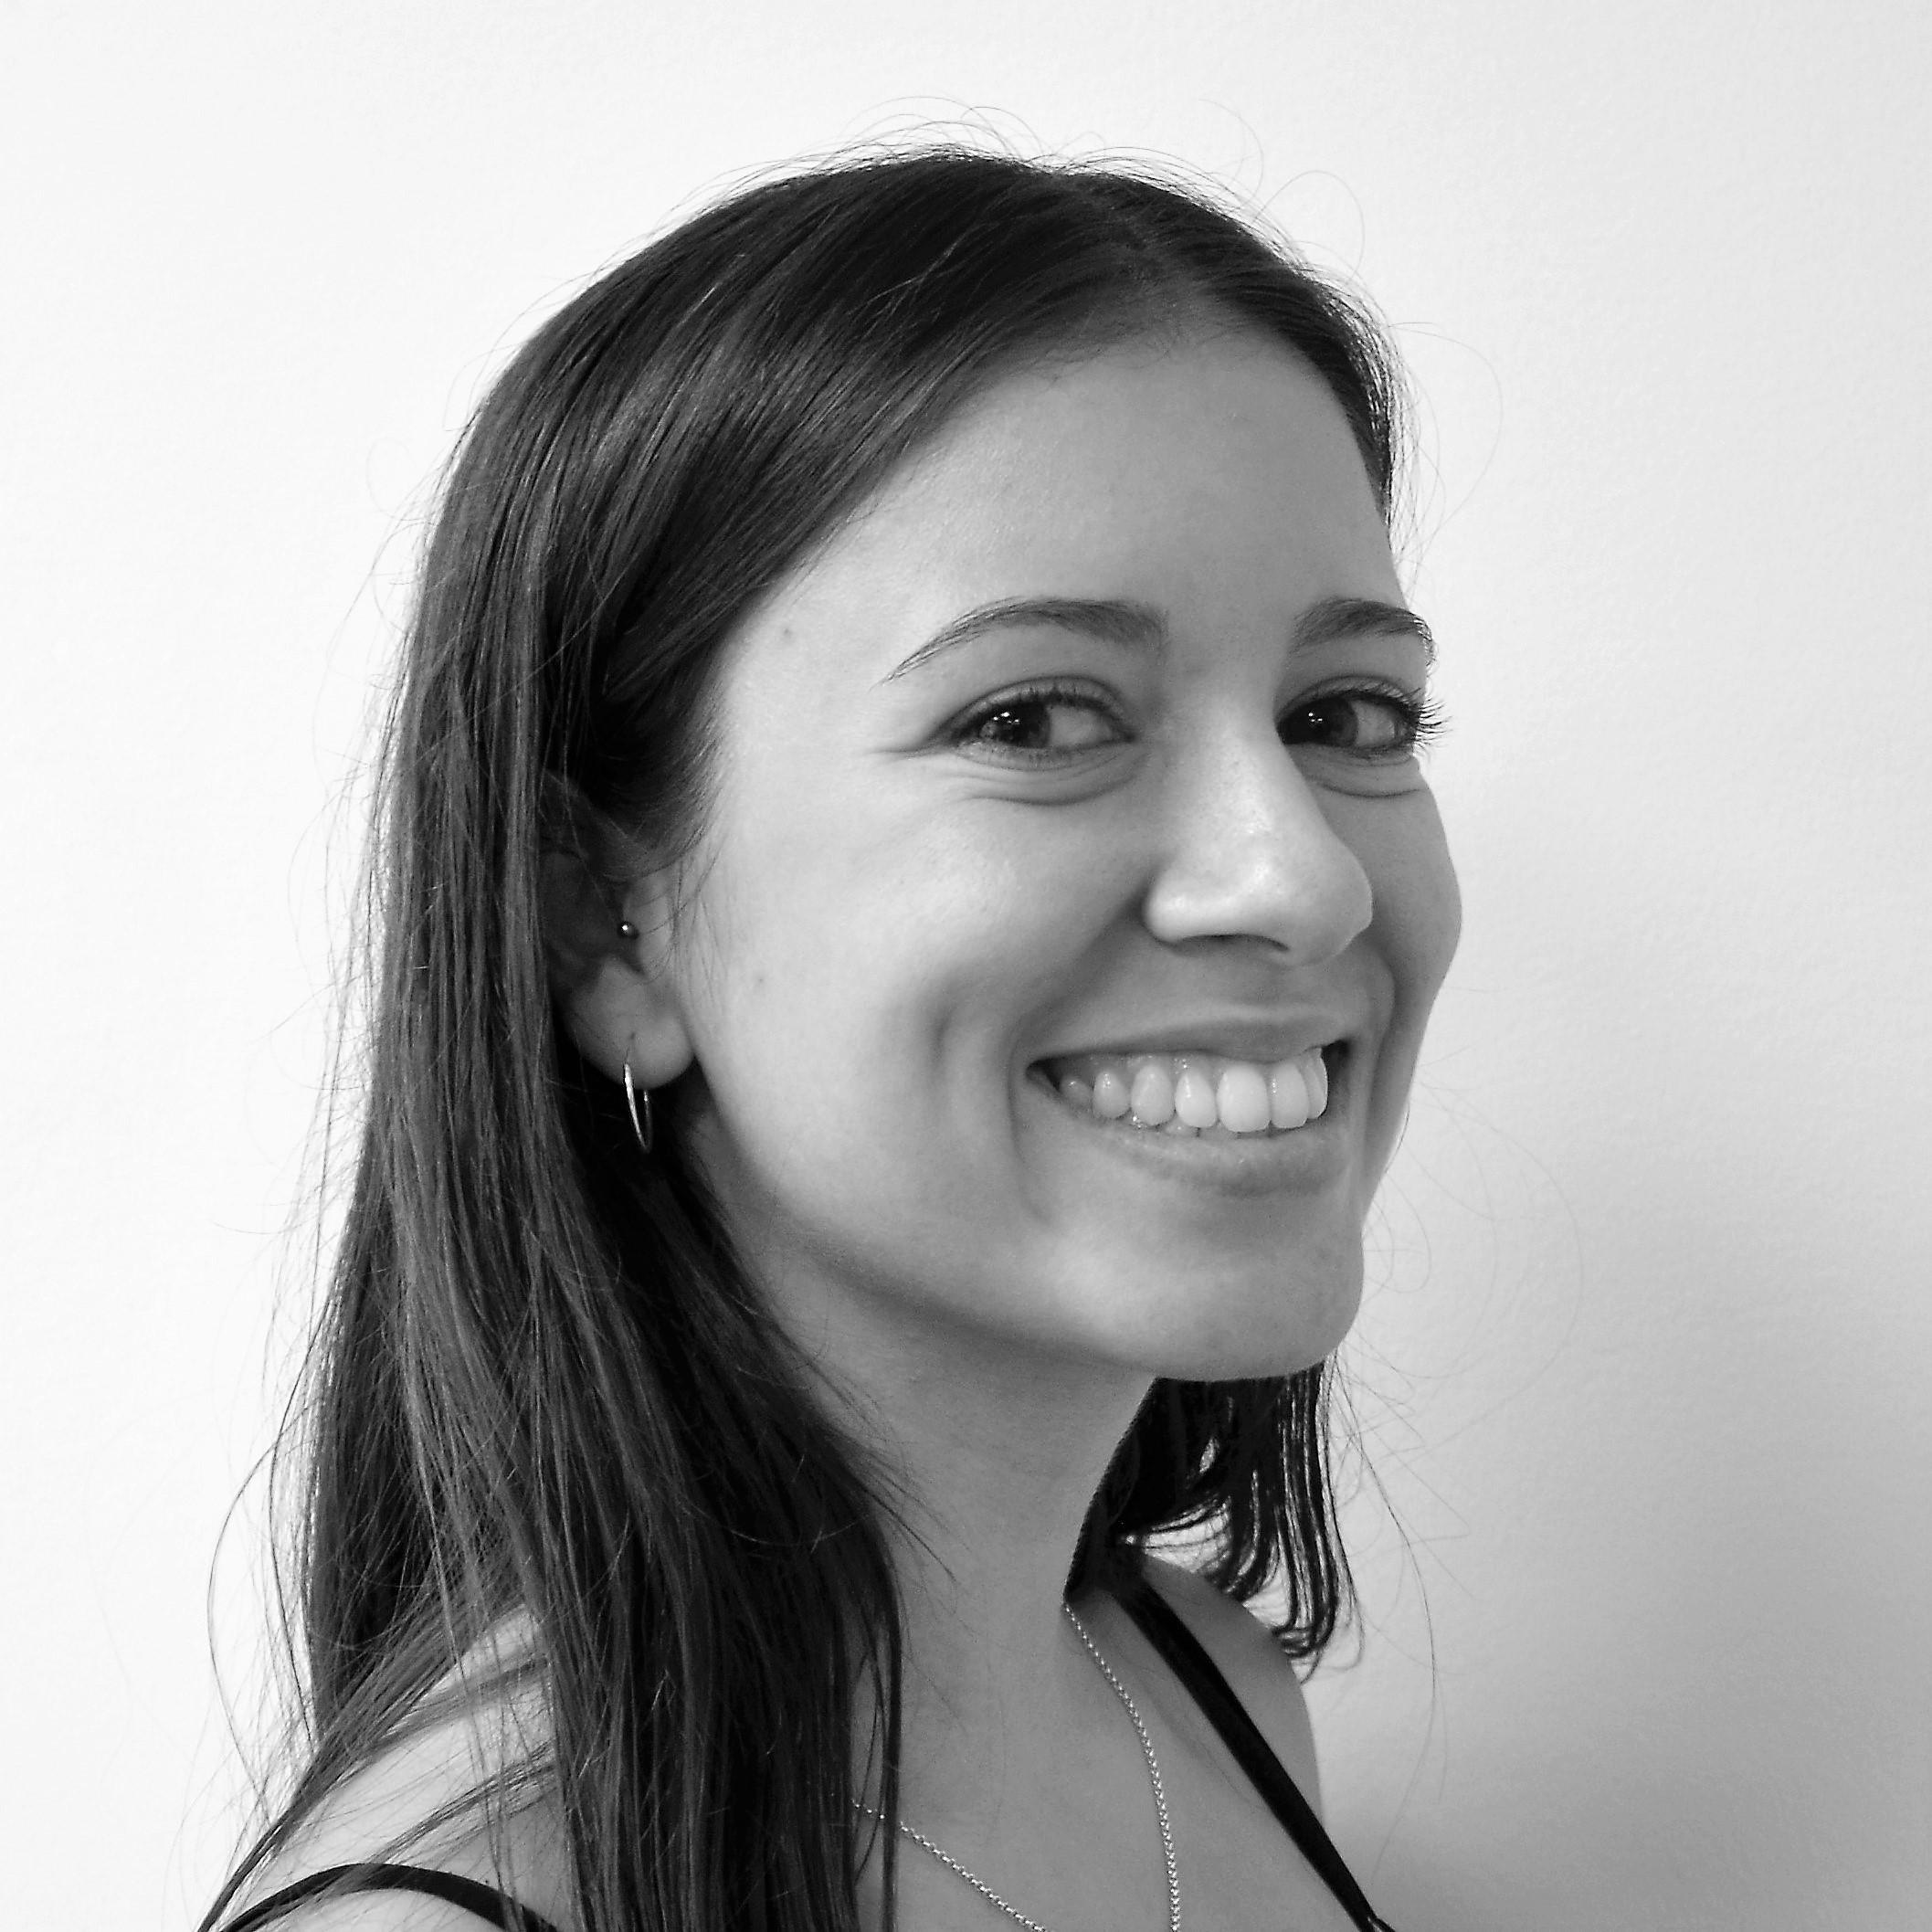 Silvia Molina